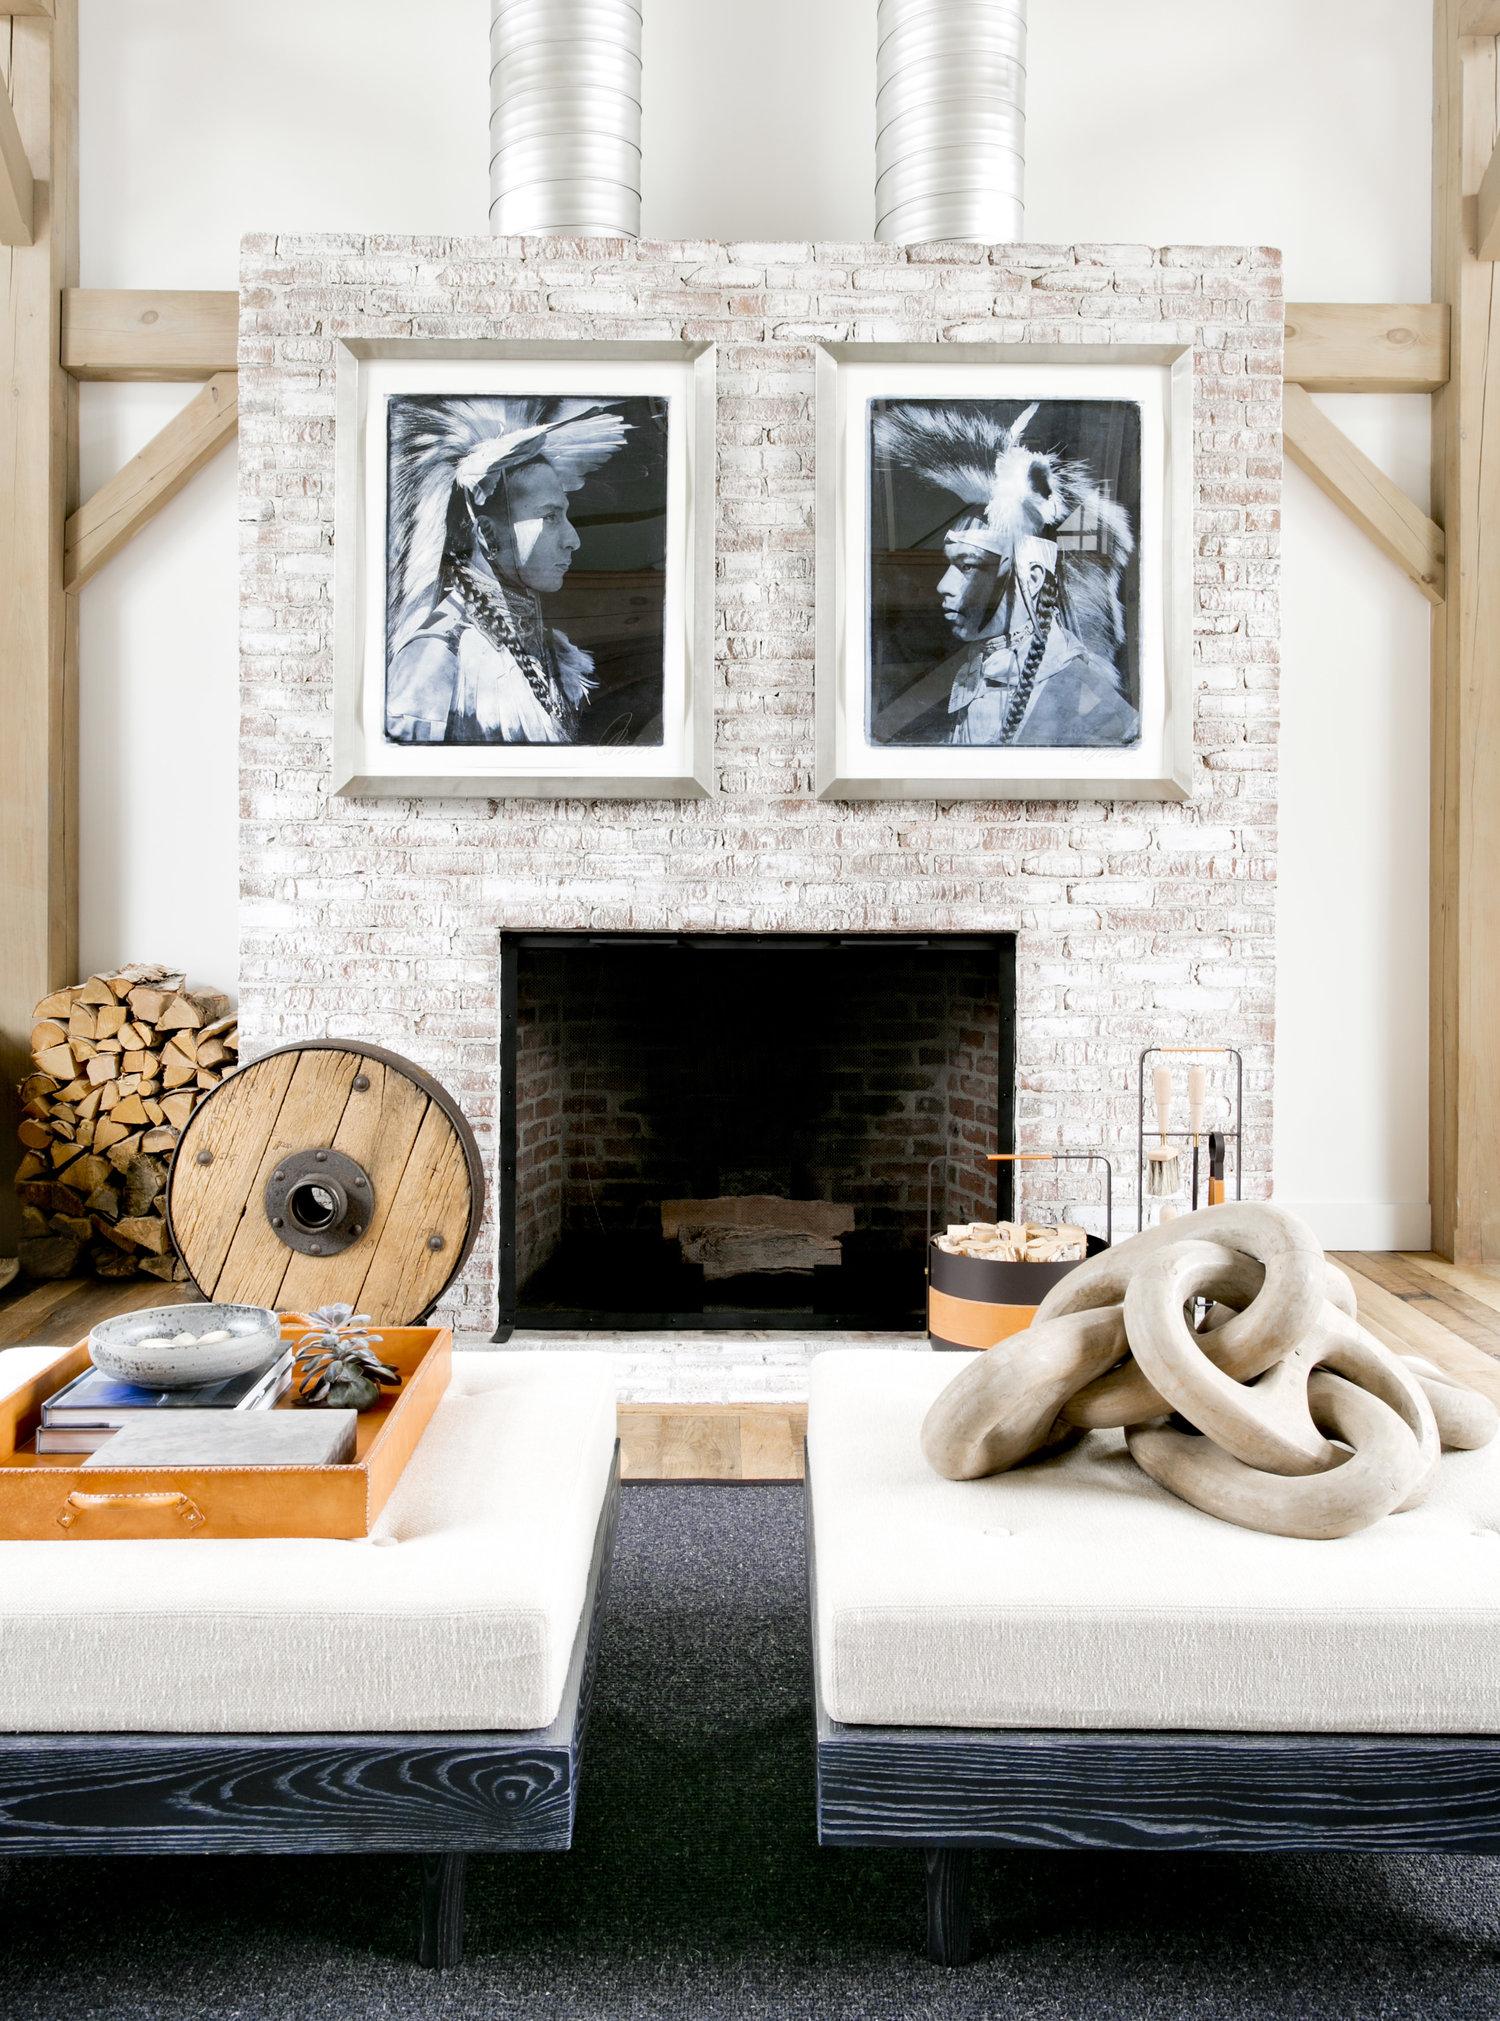 гостиная камин дымоход кирпич картины дрова